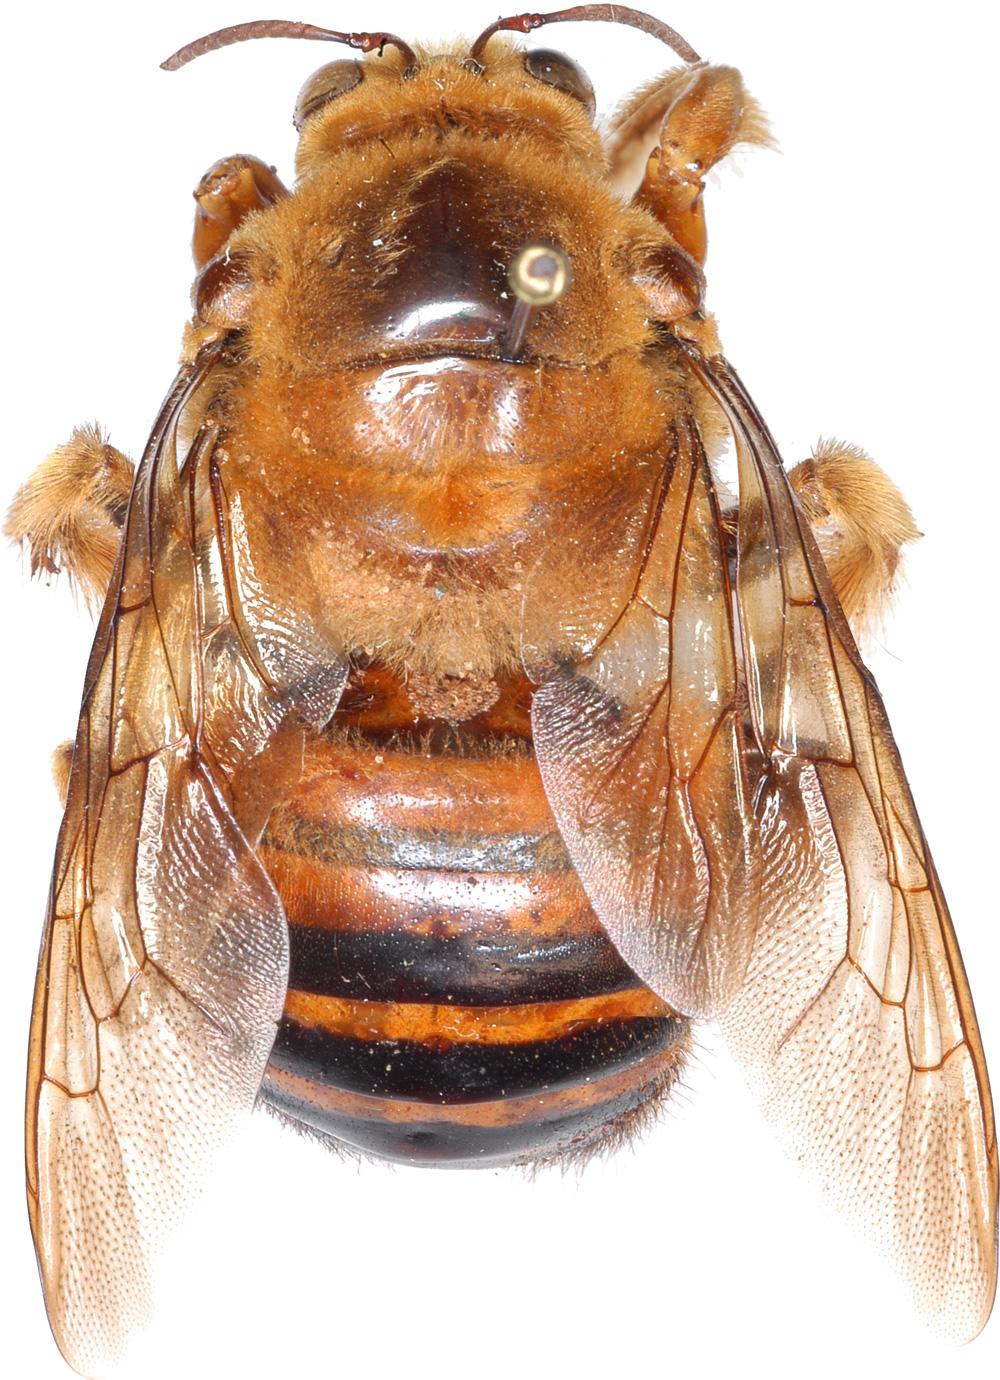 Sennertia frontalis Vitzthum, 1941 (Acari: Chaetodactylidae)